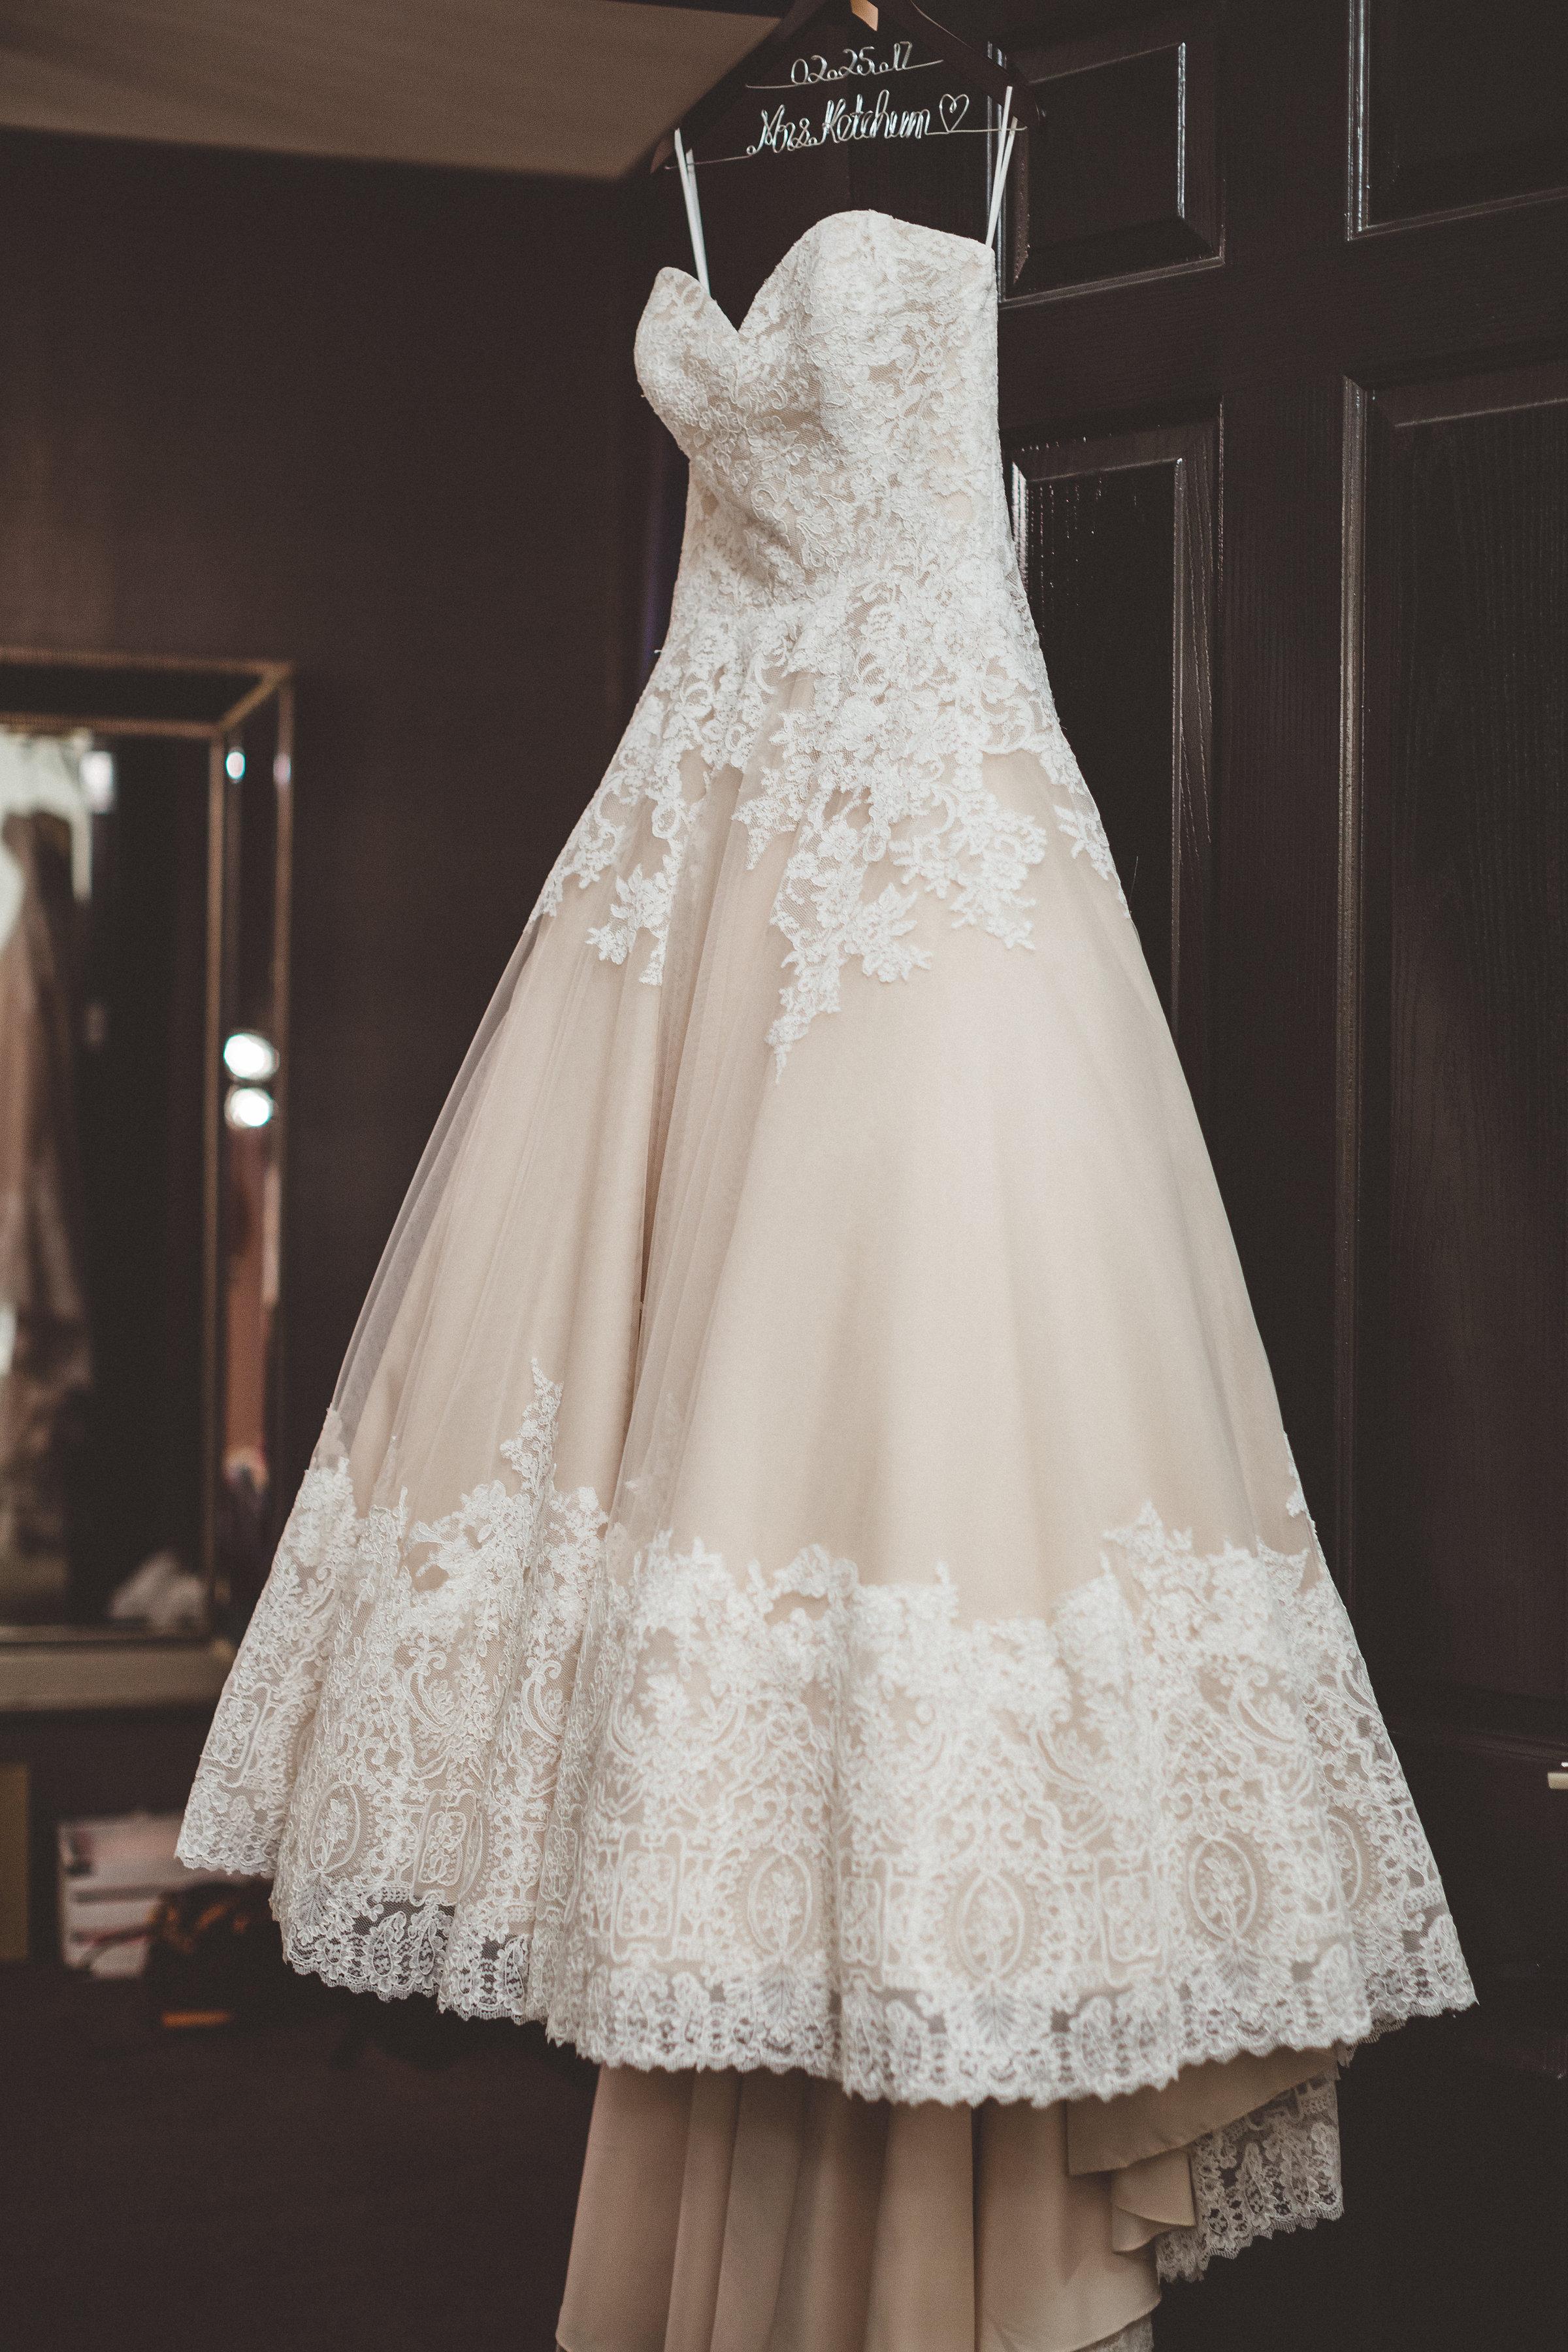 lindsey-and-ryan-intimate-winter-wedding1.jpg